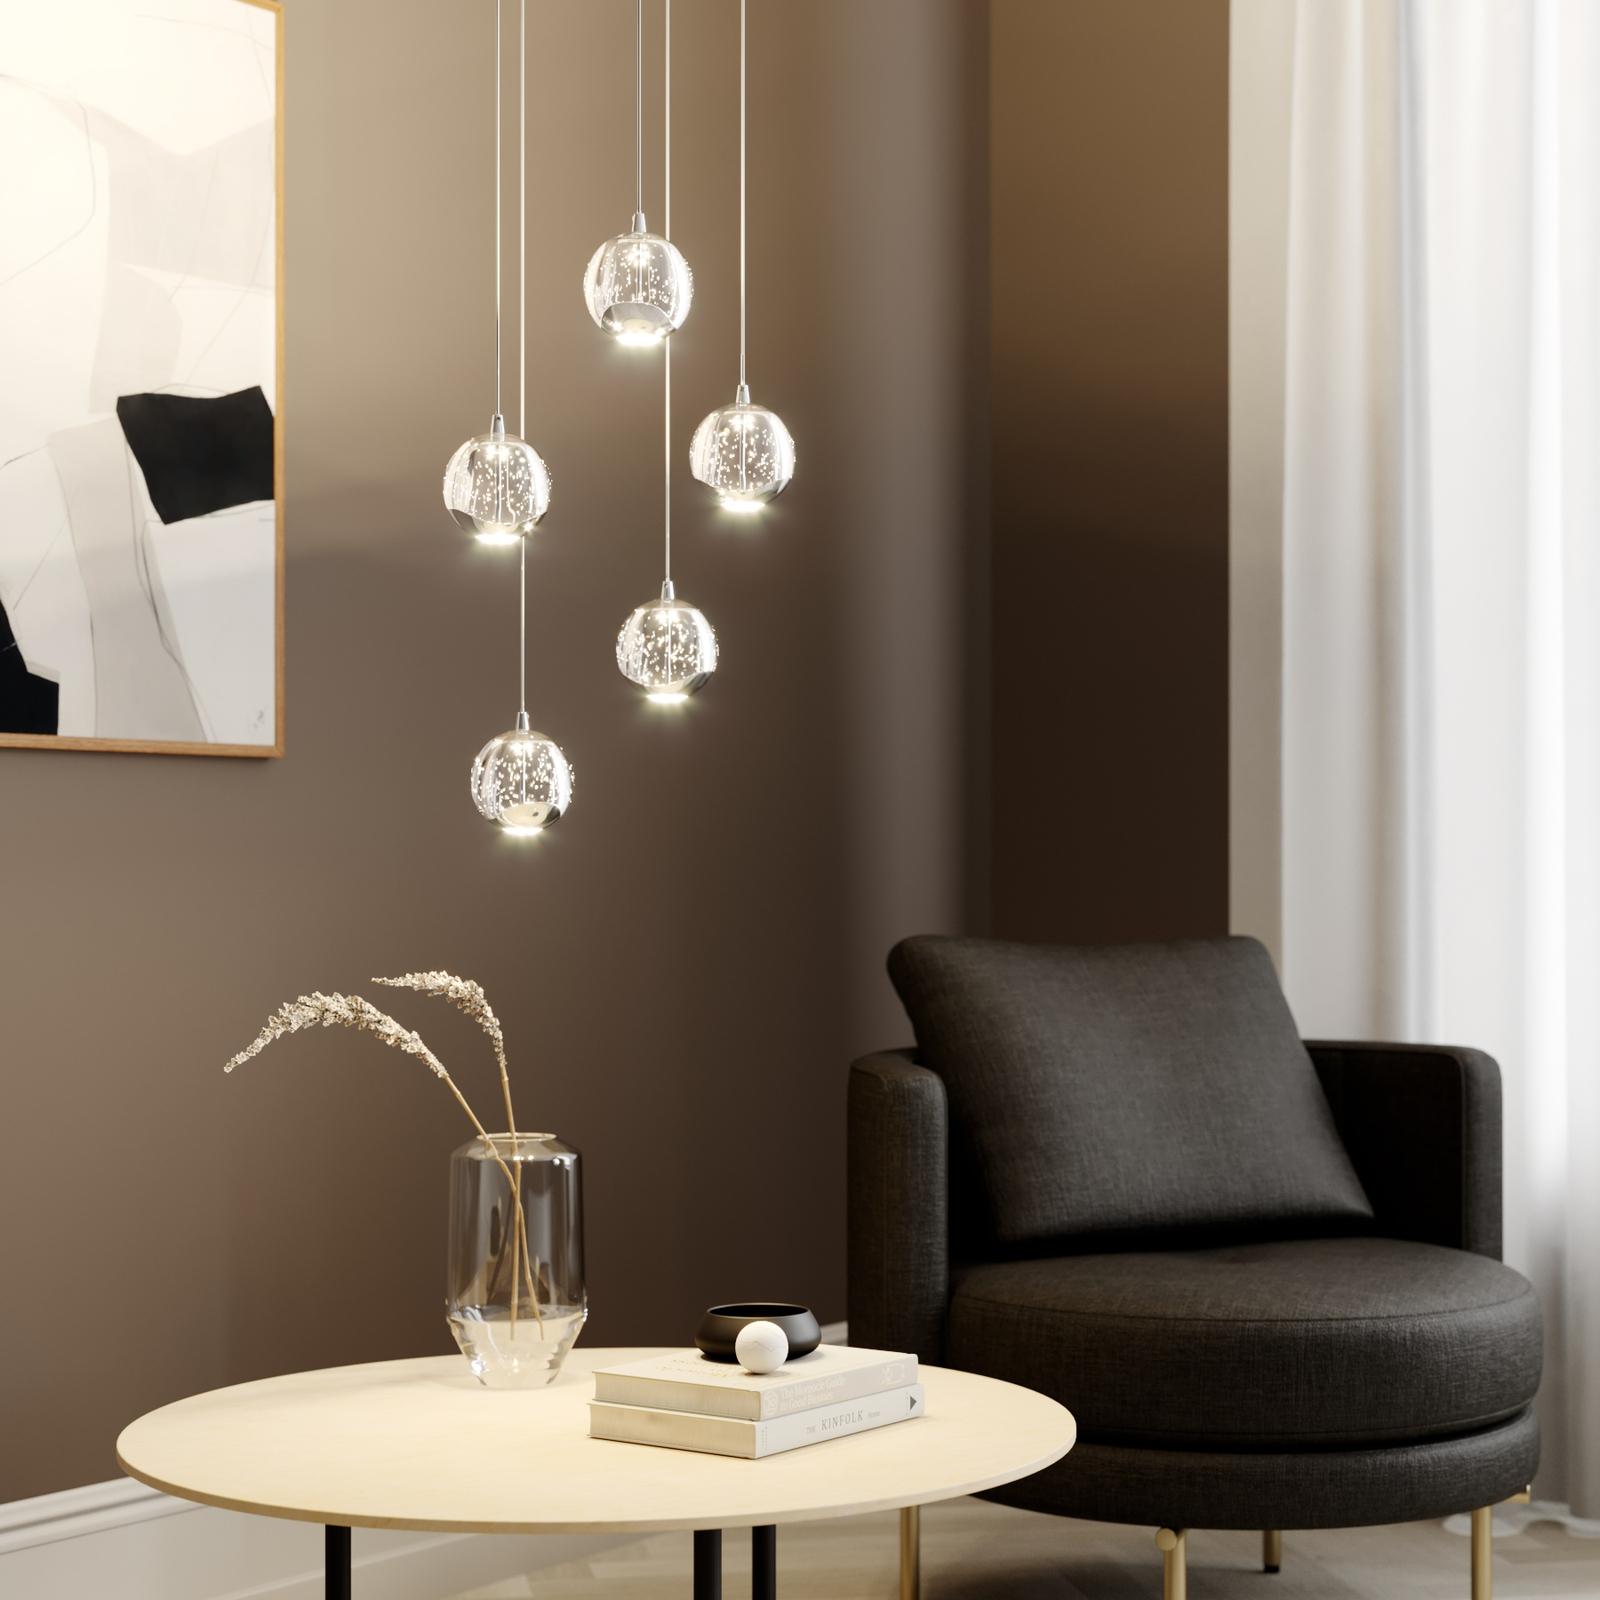 LED-pendellampe Hayley, 5 lyskilder, rund, krom